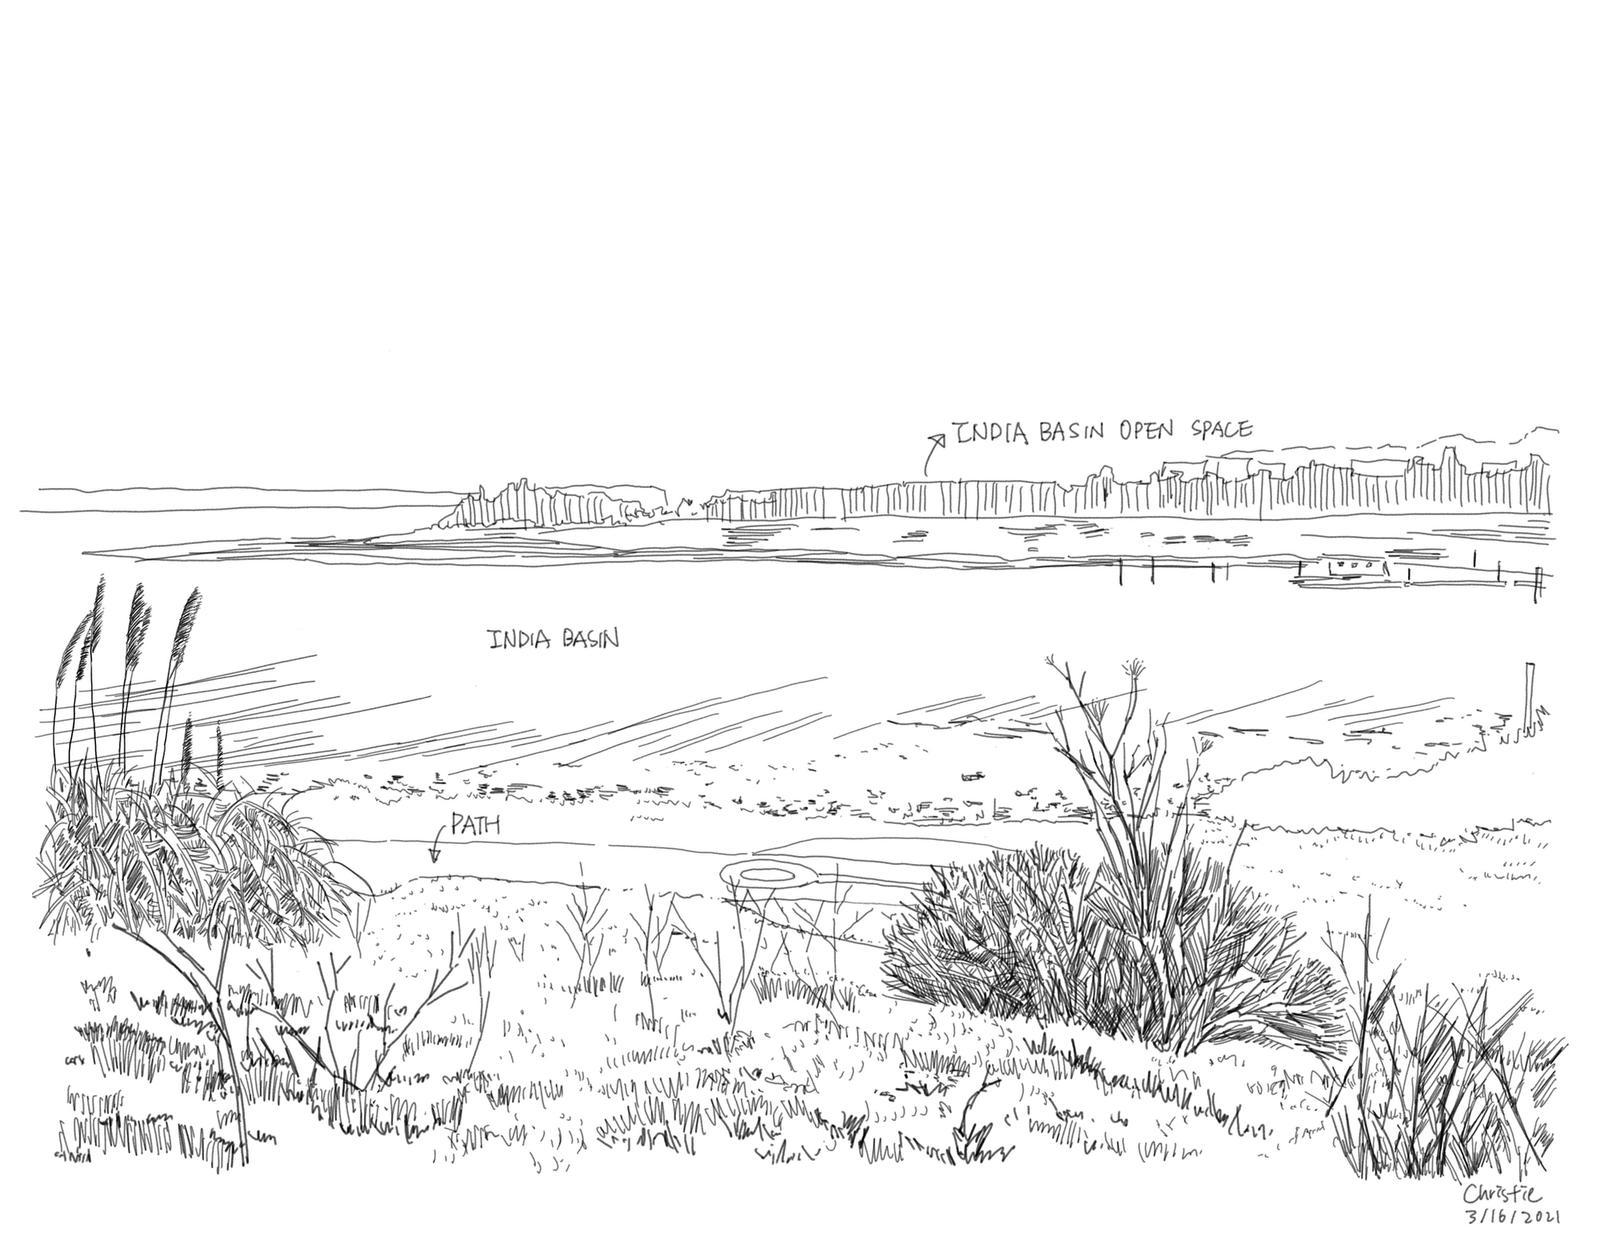 India Basin Park, San Francisco - Site Inventory Sketch 3